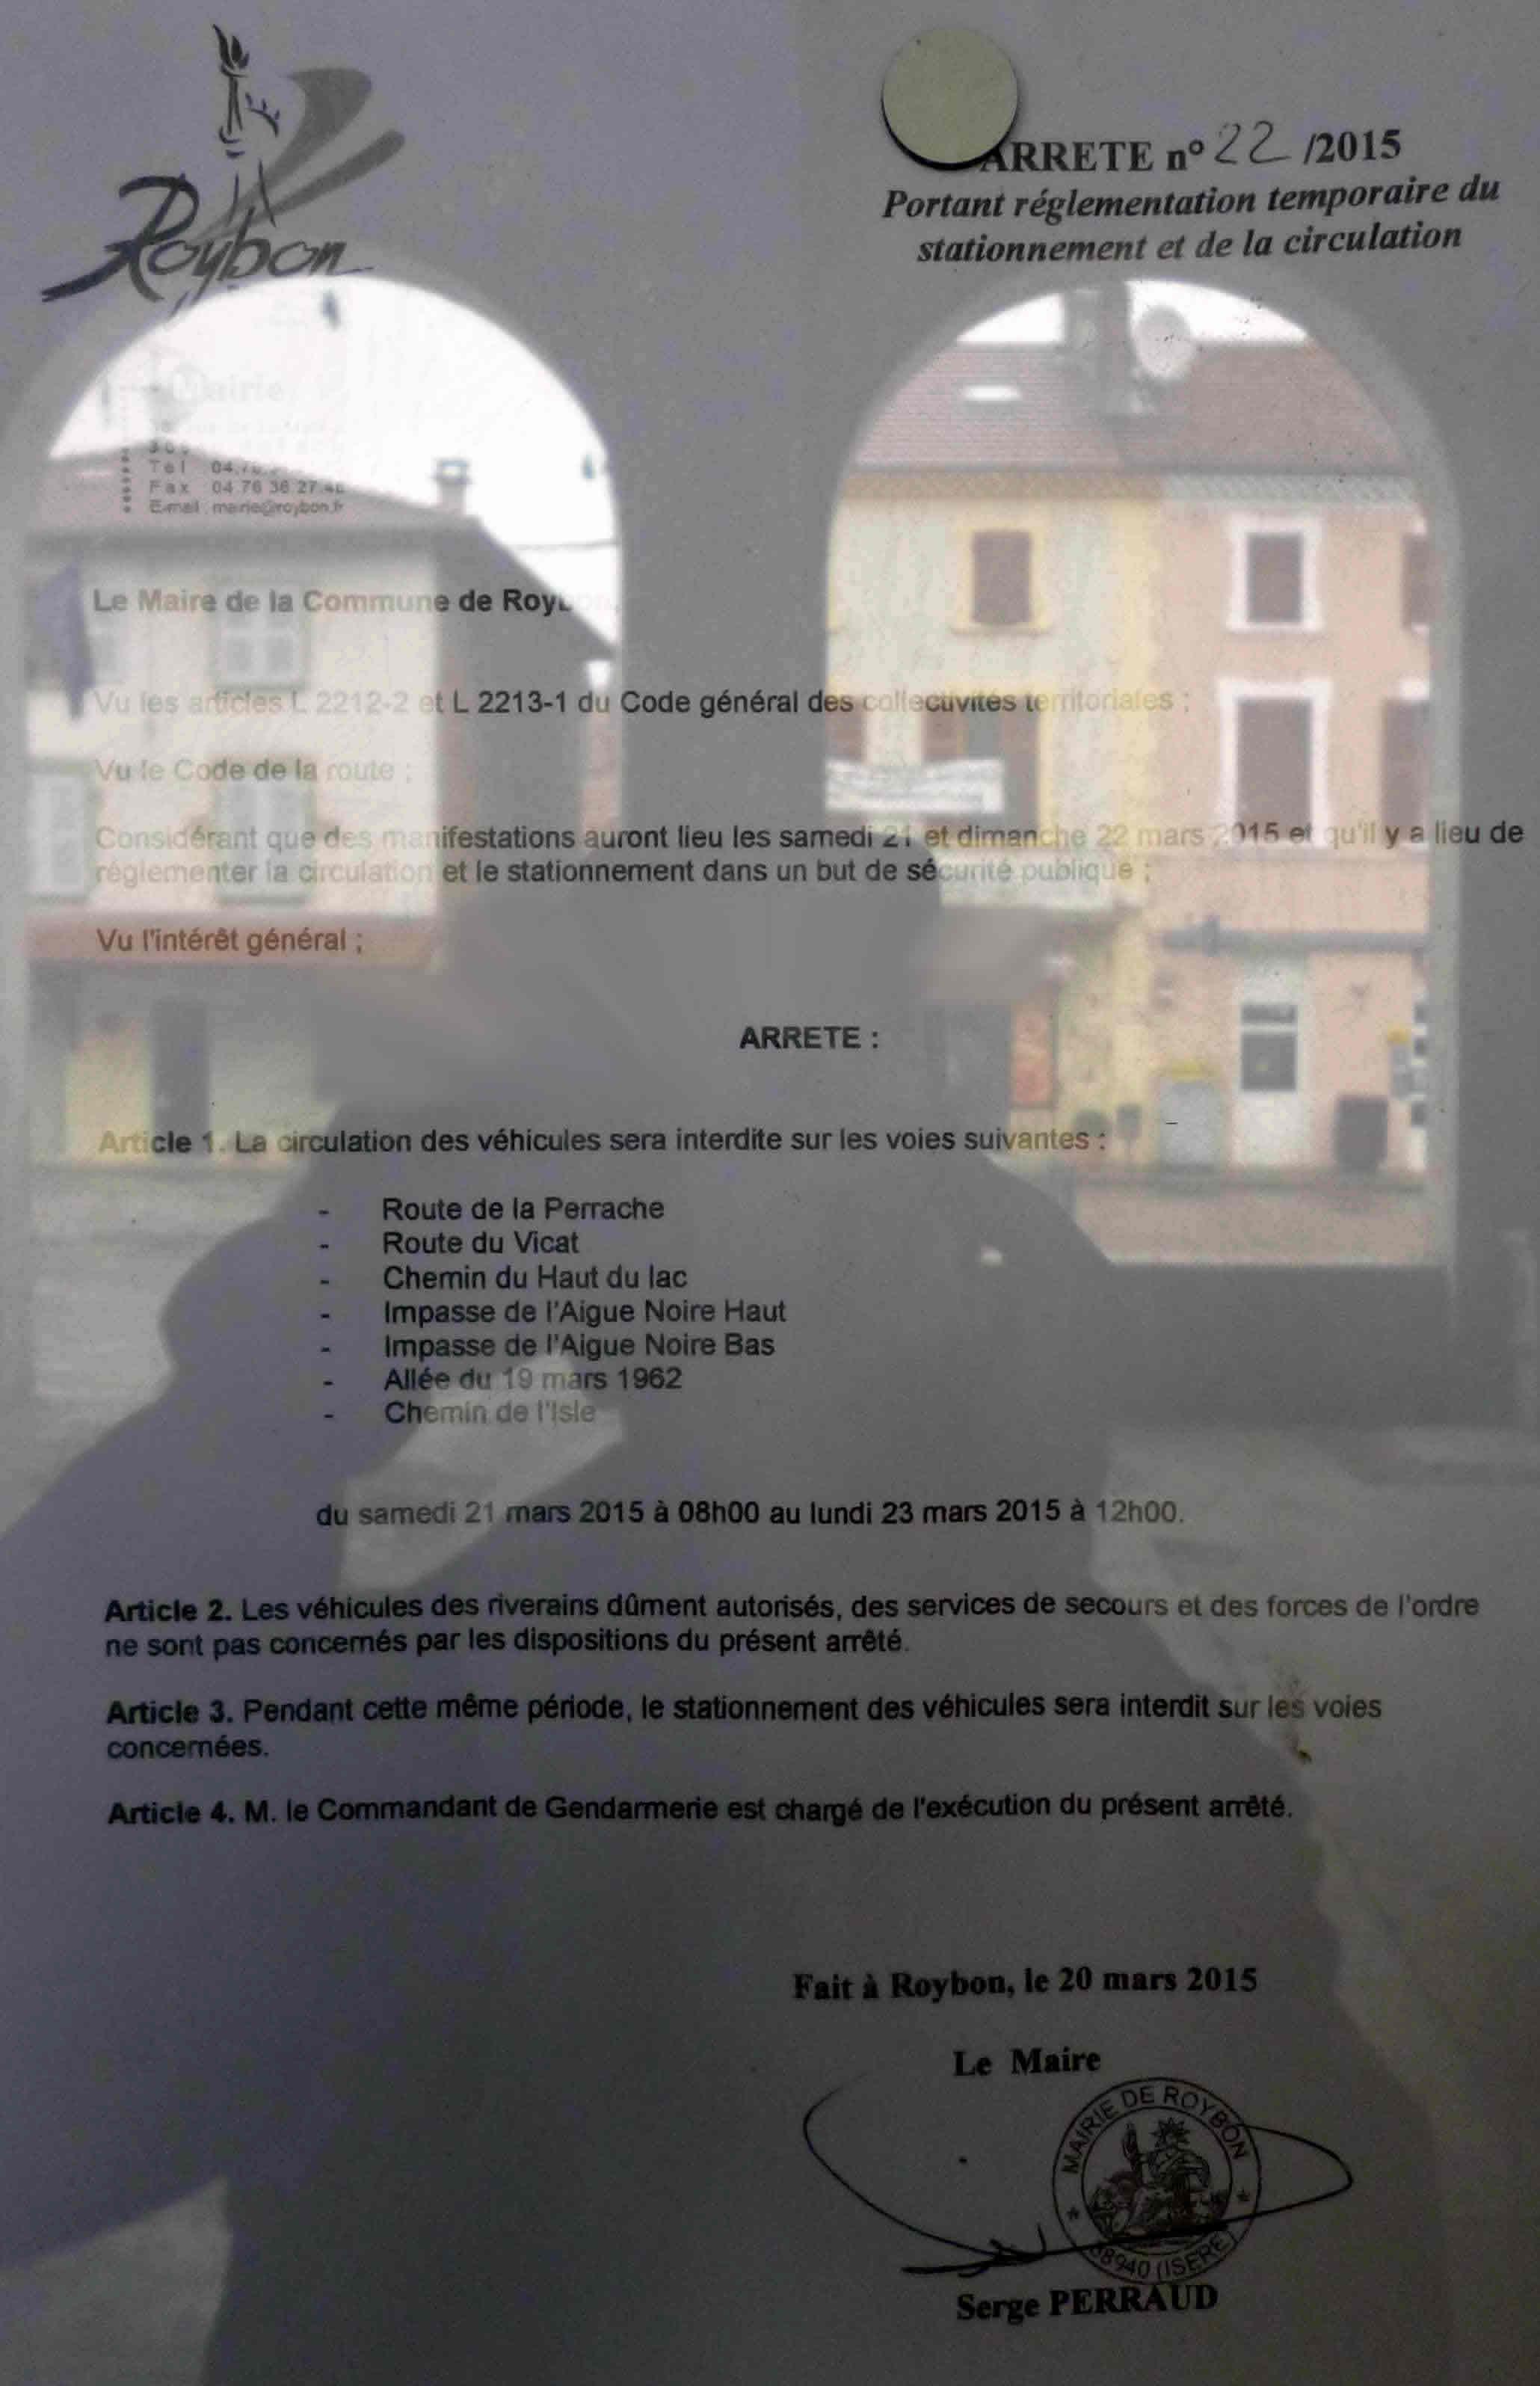 http://juralib.noblogs.org/files/2015/03/A.Municipal-du-20-au-23-03-15.jpg